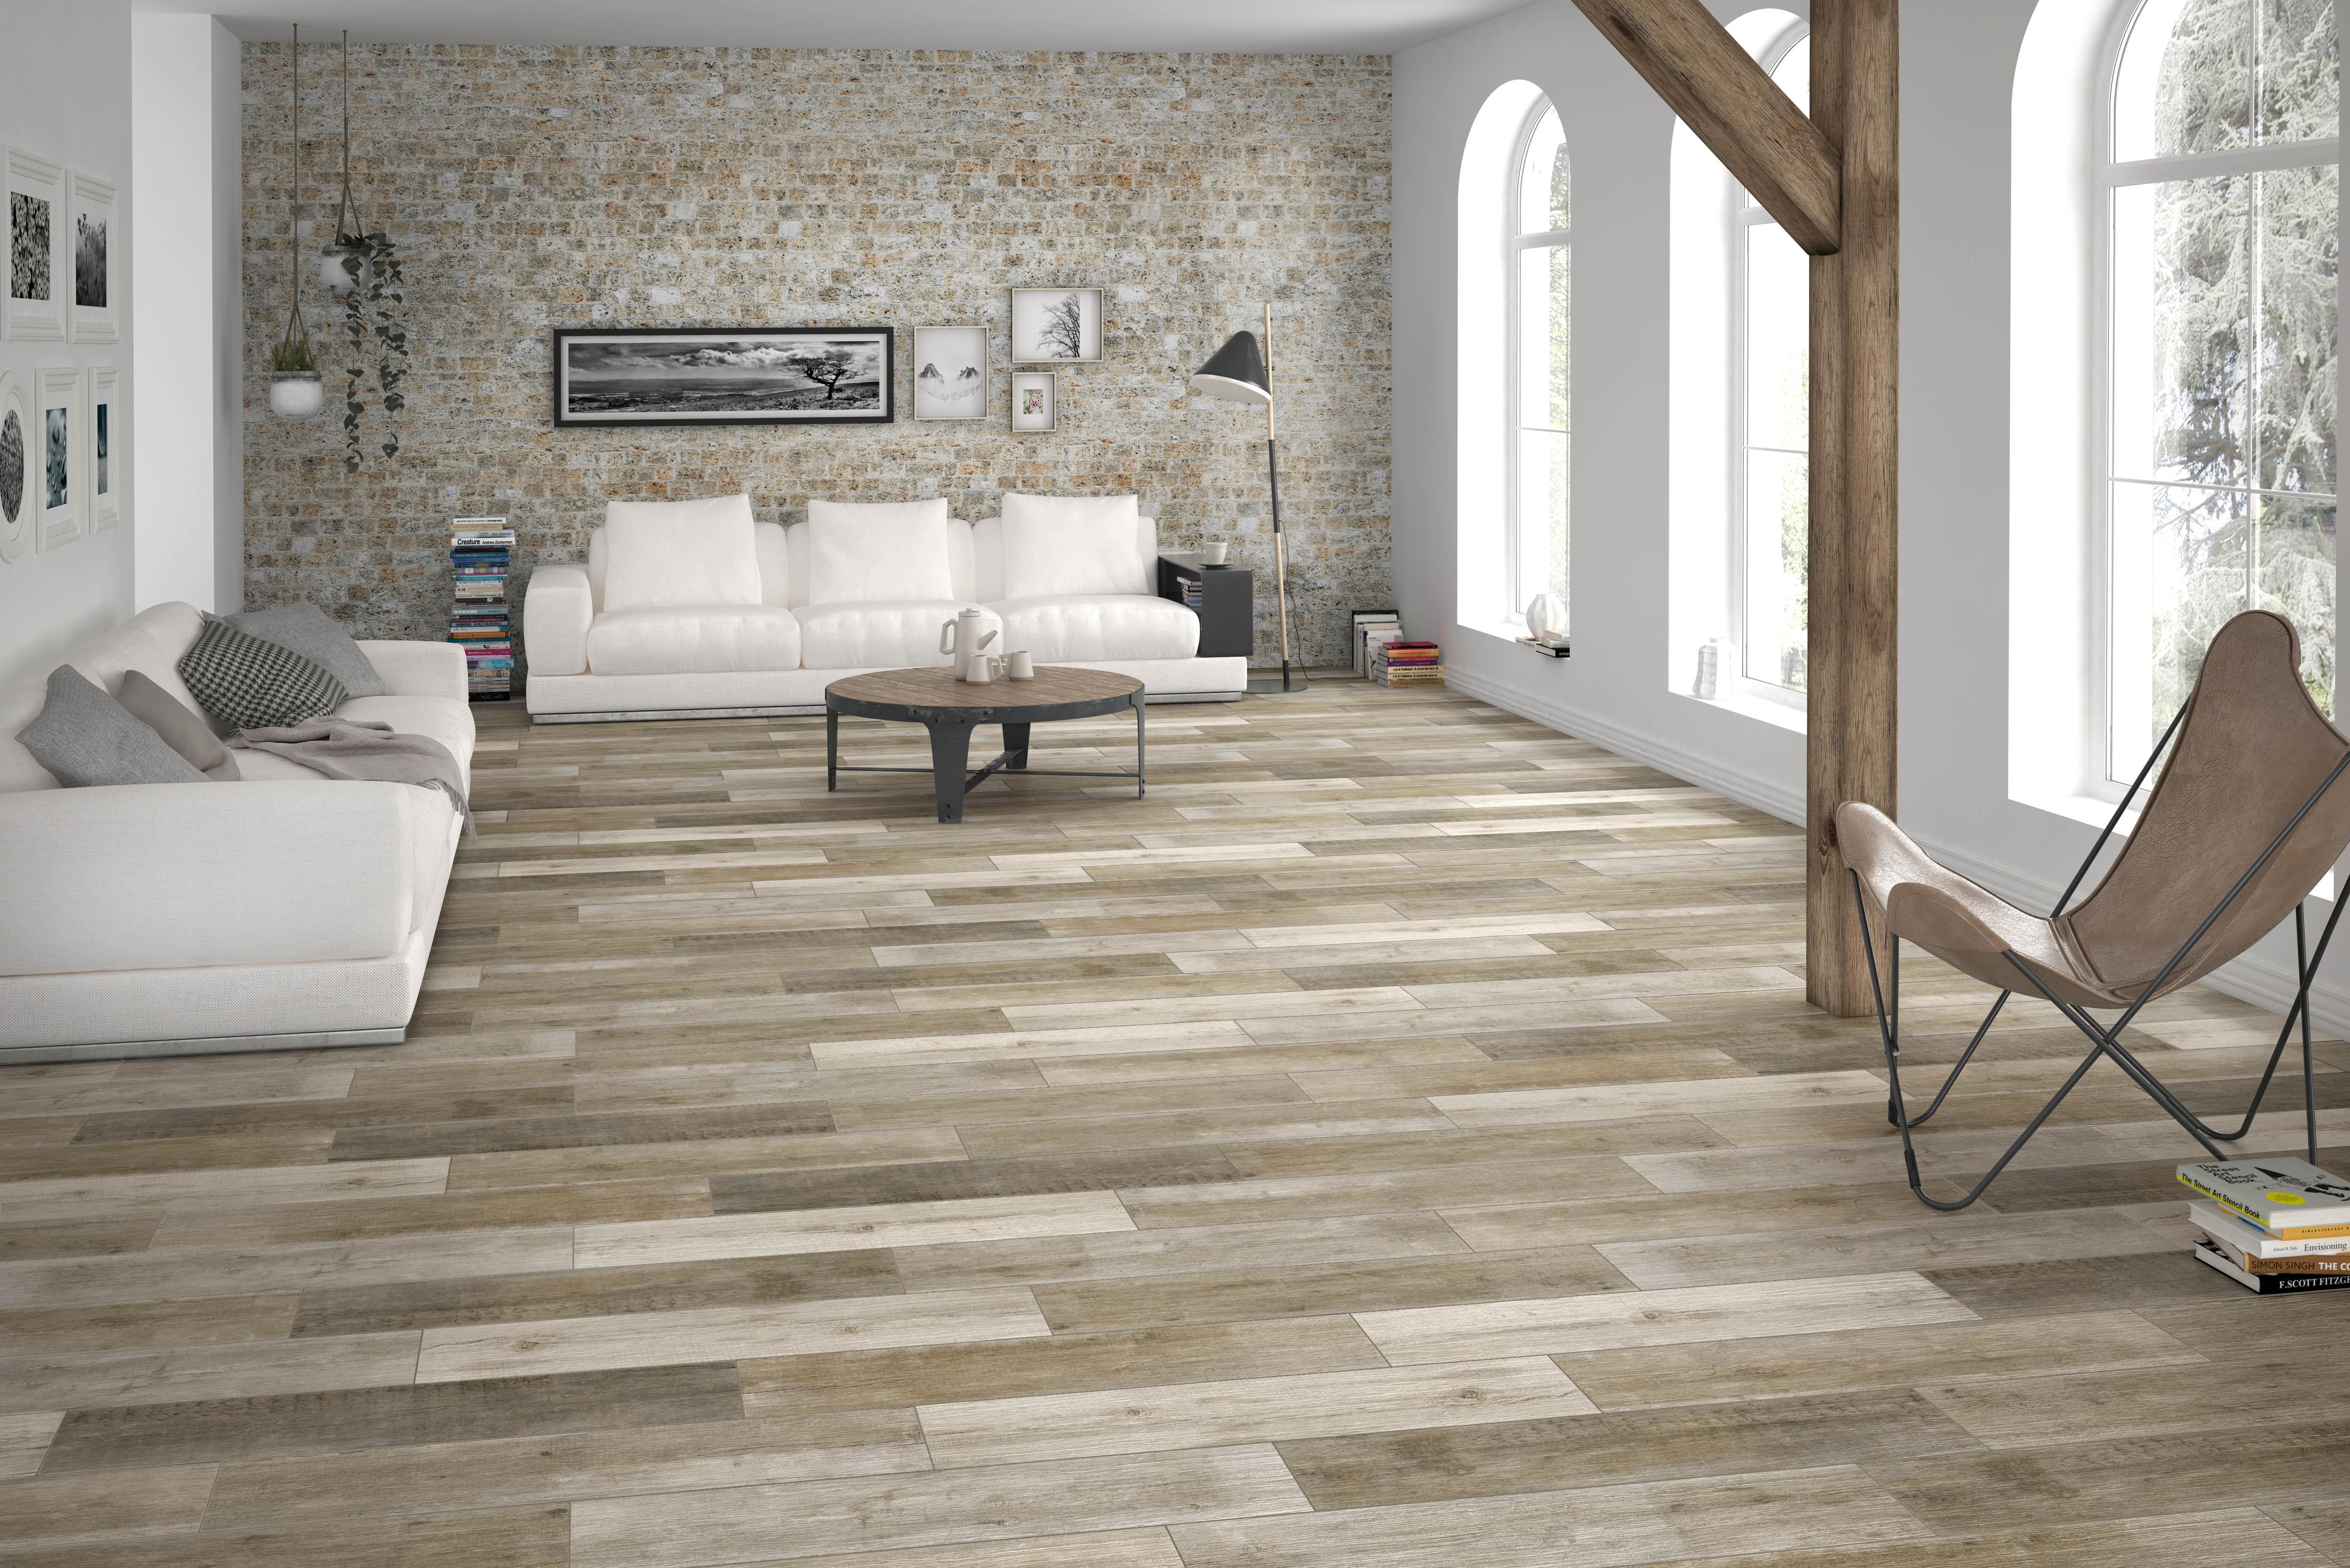 Laminate wood rigo tile 2017 rigo tile inc all rights reserved robertocjr sitemap dailygadgetfo Choice Image